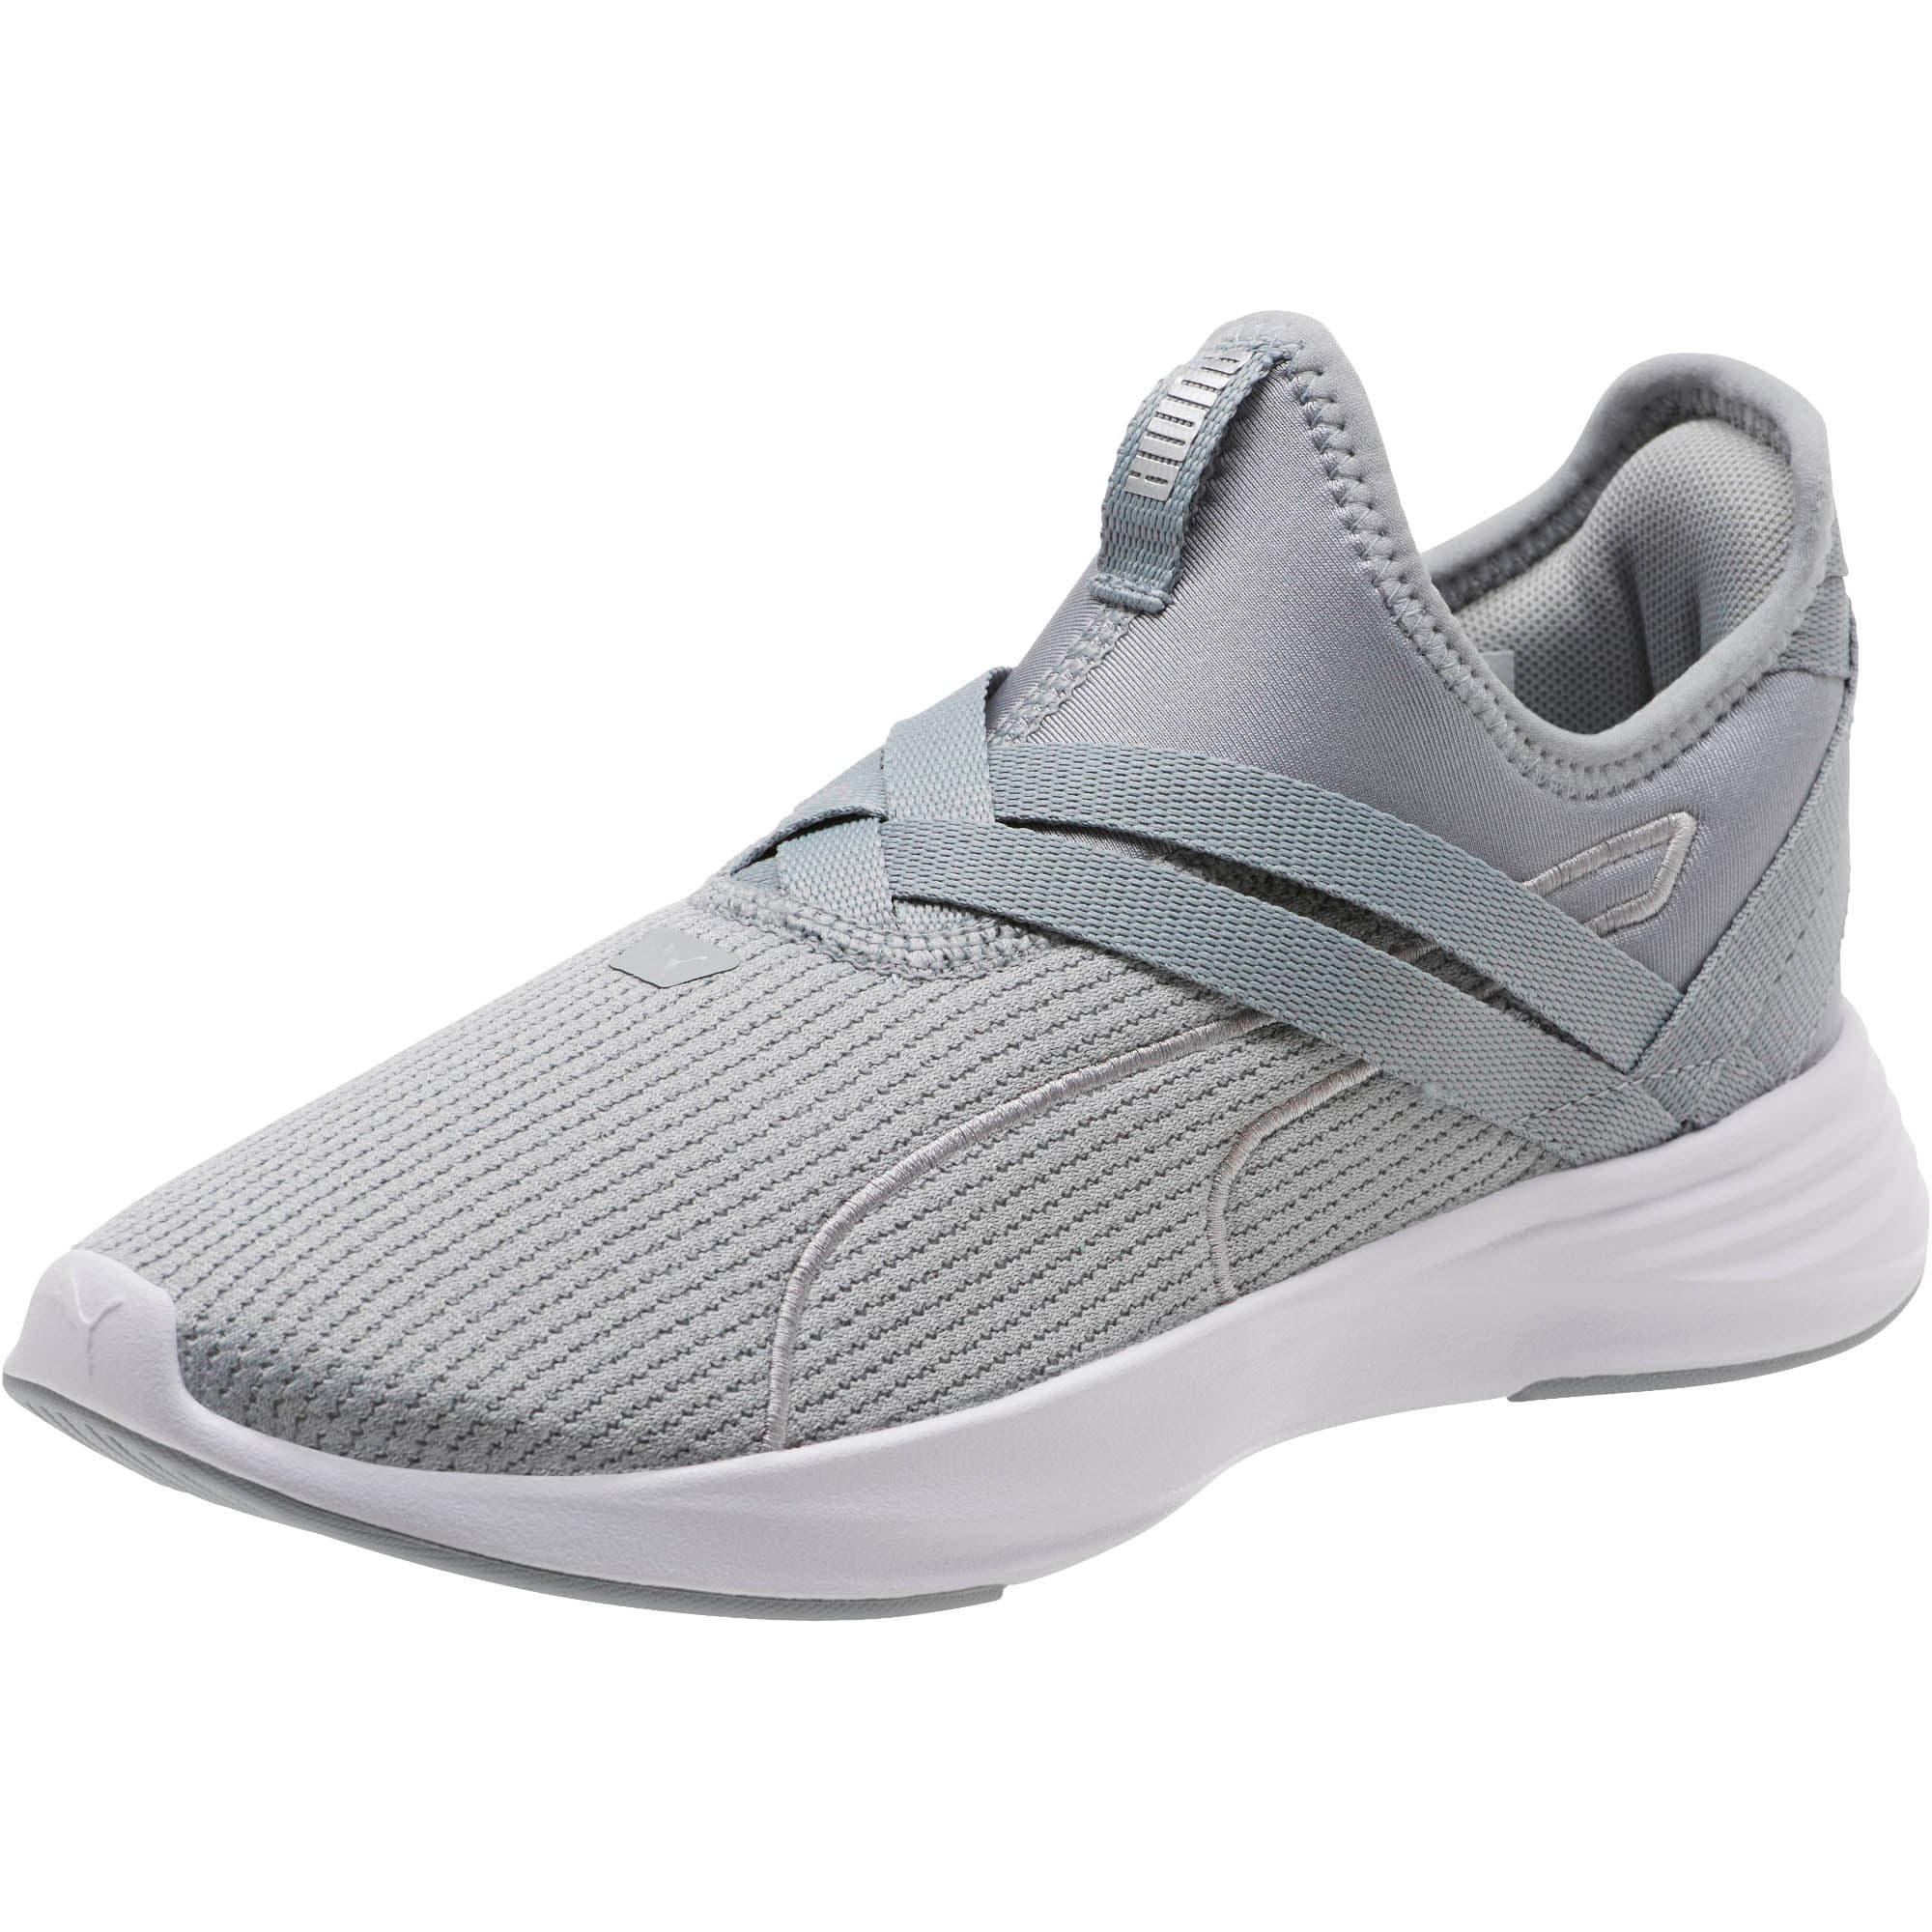 Thumbnail 1 of Radiate XT Slip-On Women's Sneakers, Quarry-Puma Silver, medium